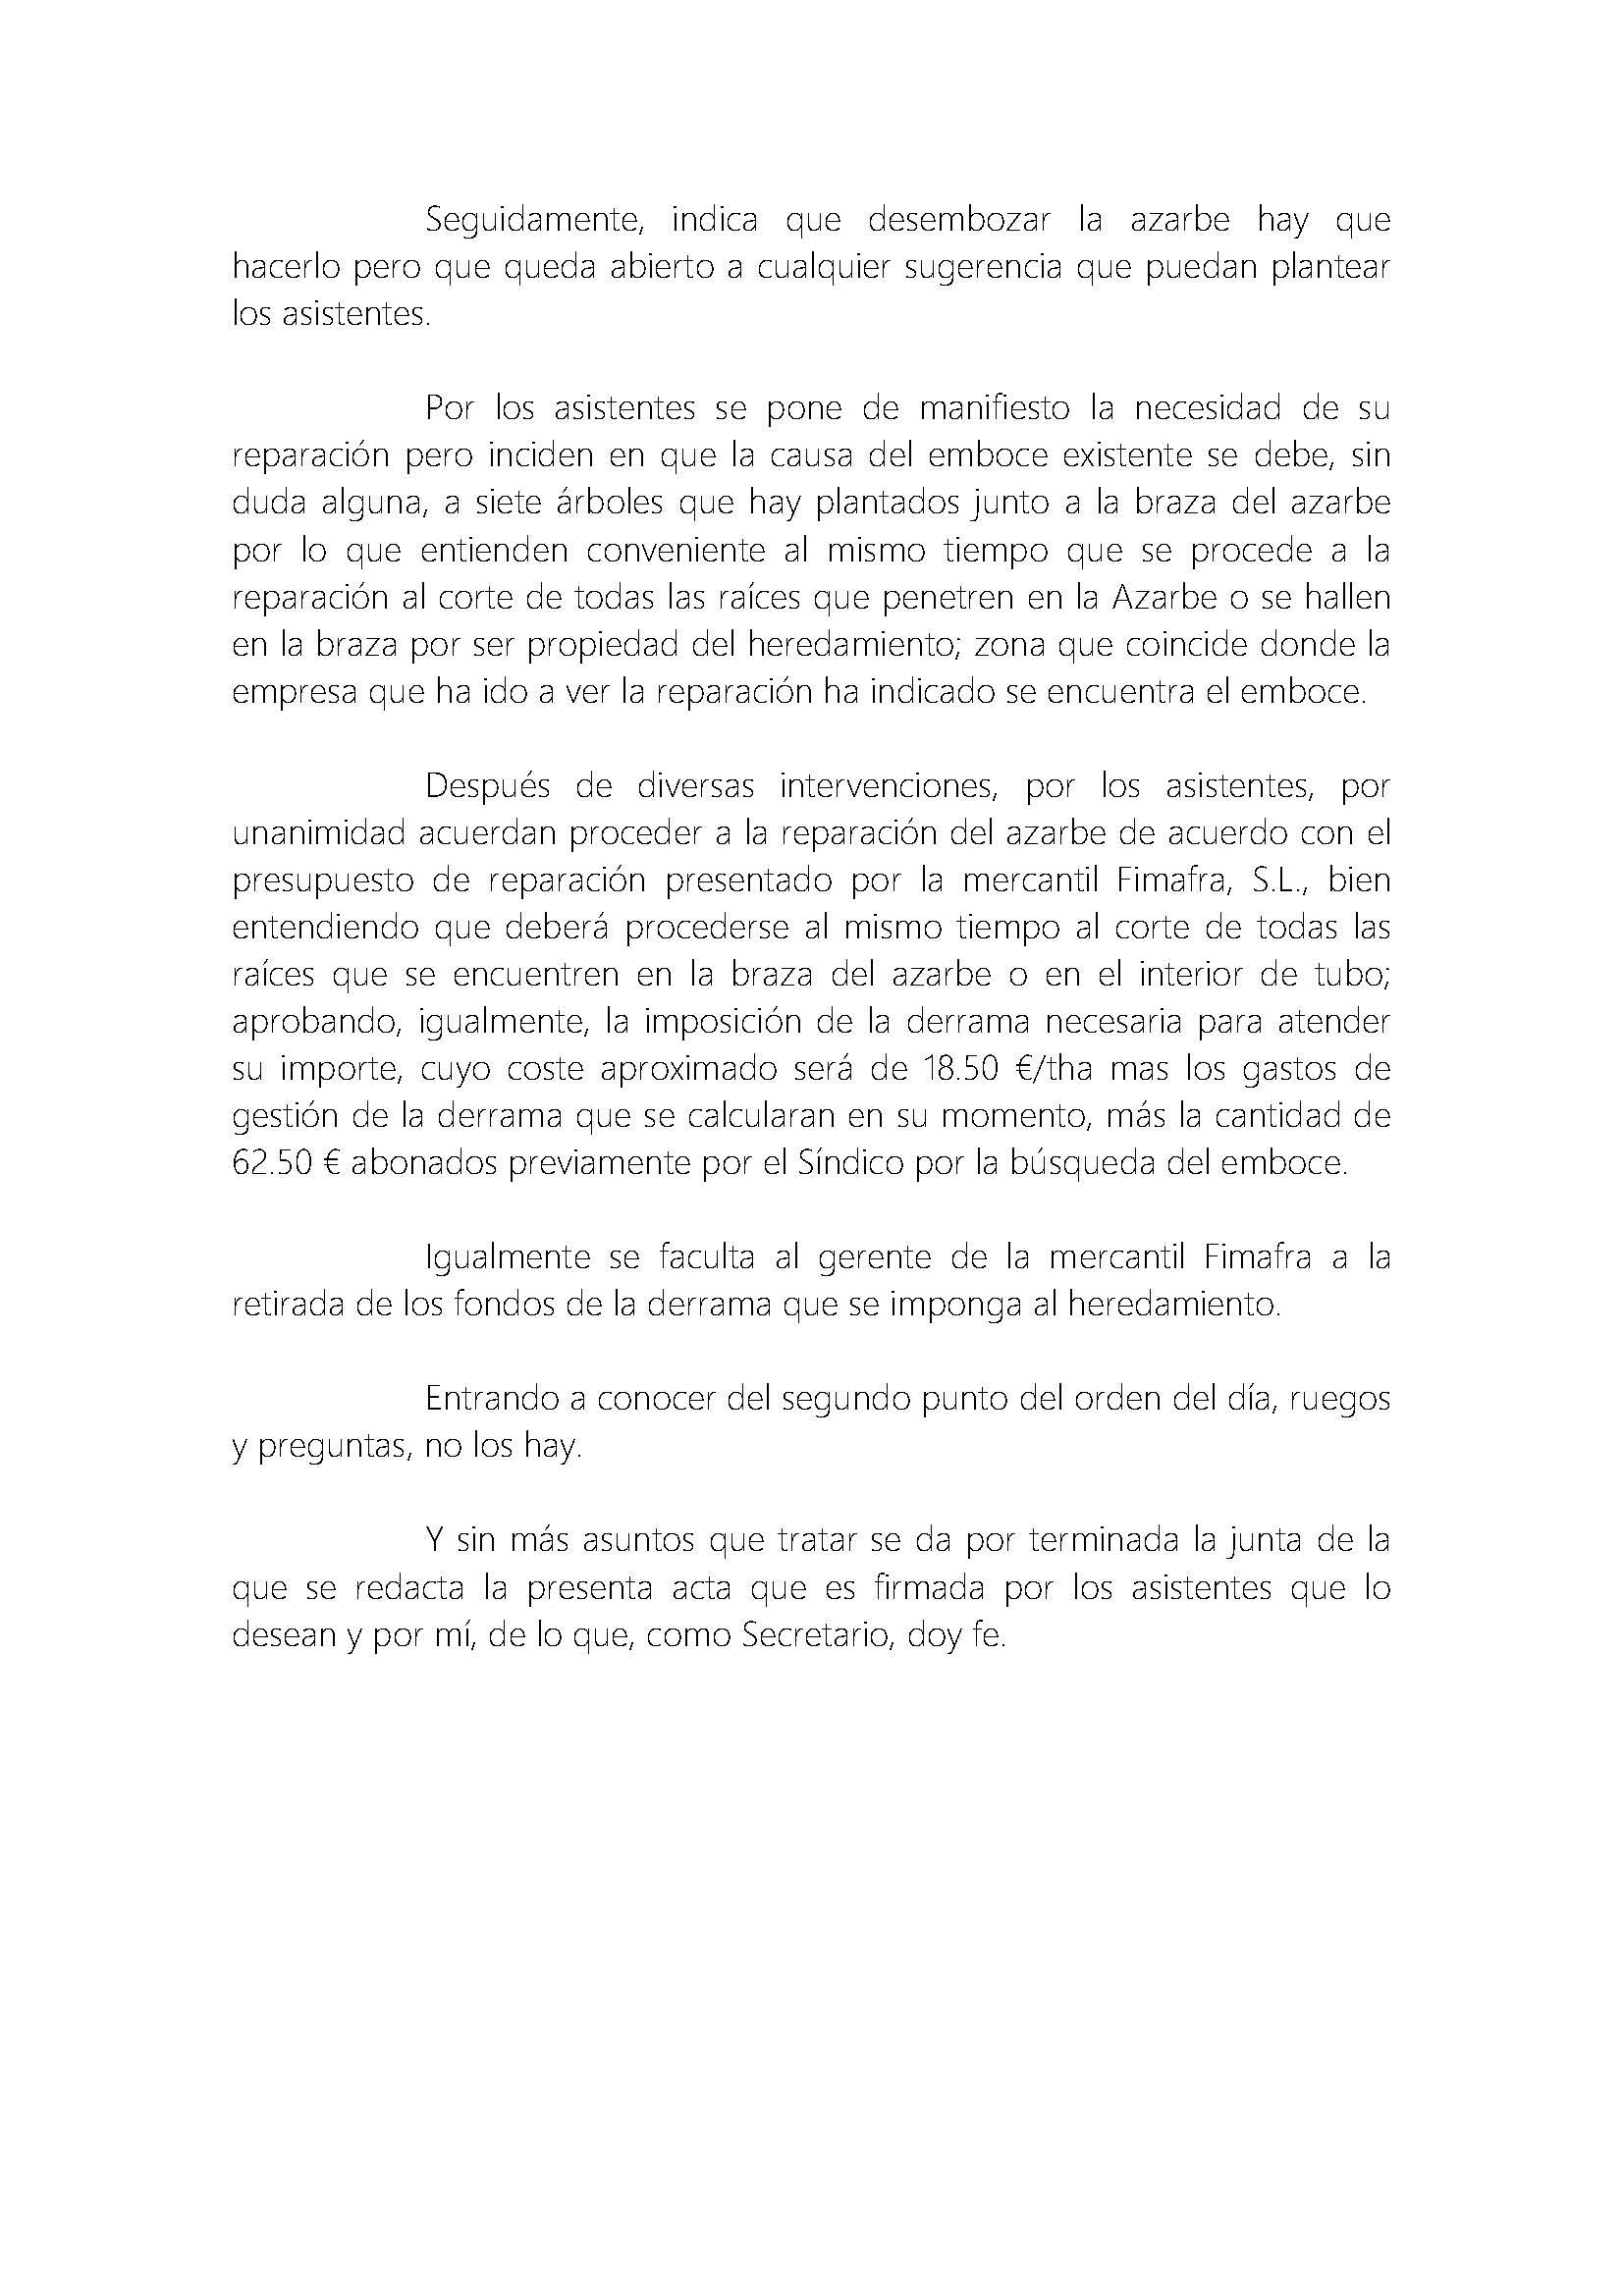 177 2015 AZARBE DE LA VEREDA. ACTA DE JUNTA GENERAL DE FECHA 04122015_Página_2